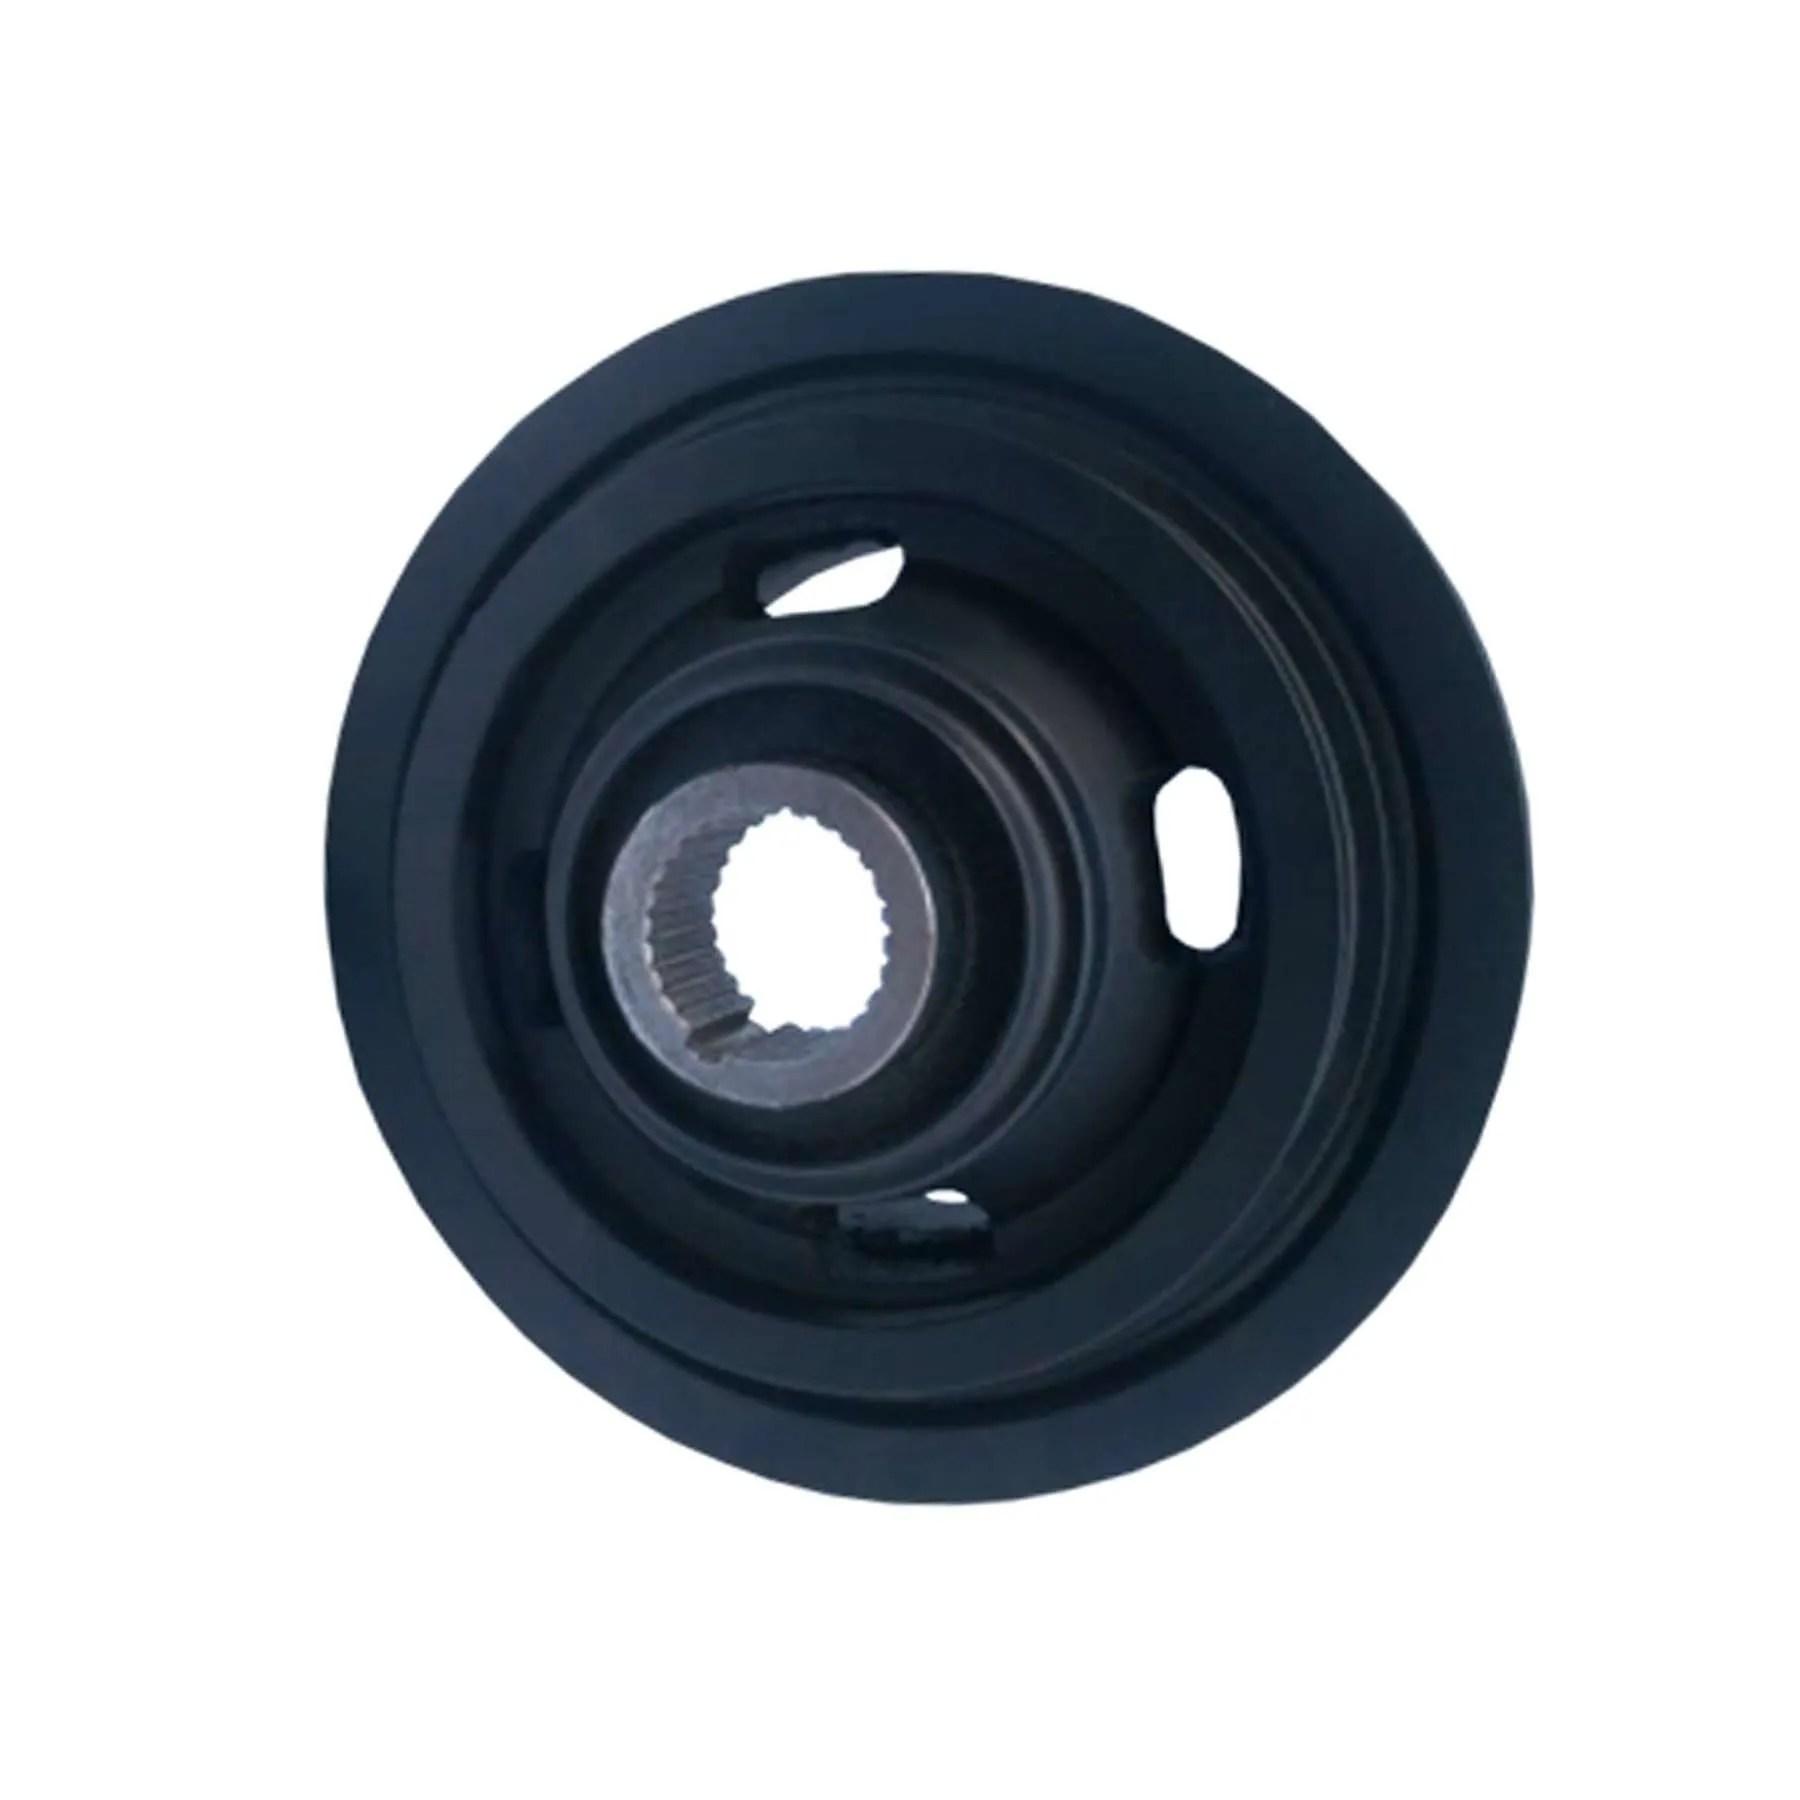 13811PY3000 fit 91 92 93 94 95 Acura Legend harmonic crankshaft pulley 3.2